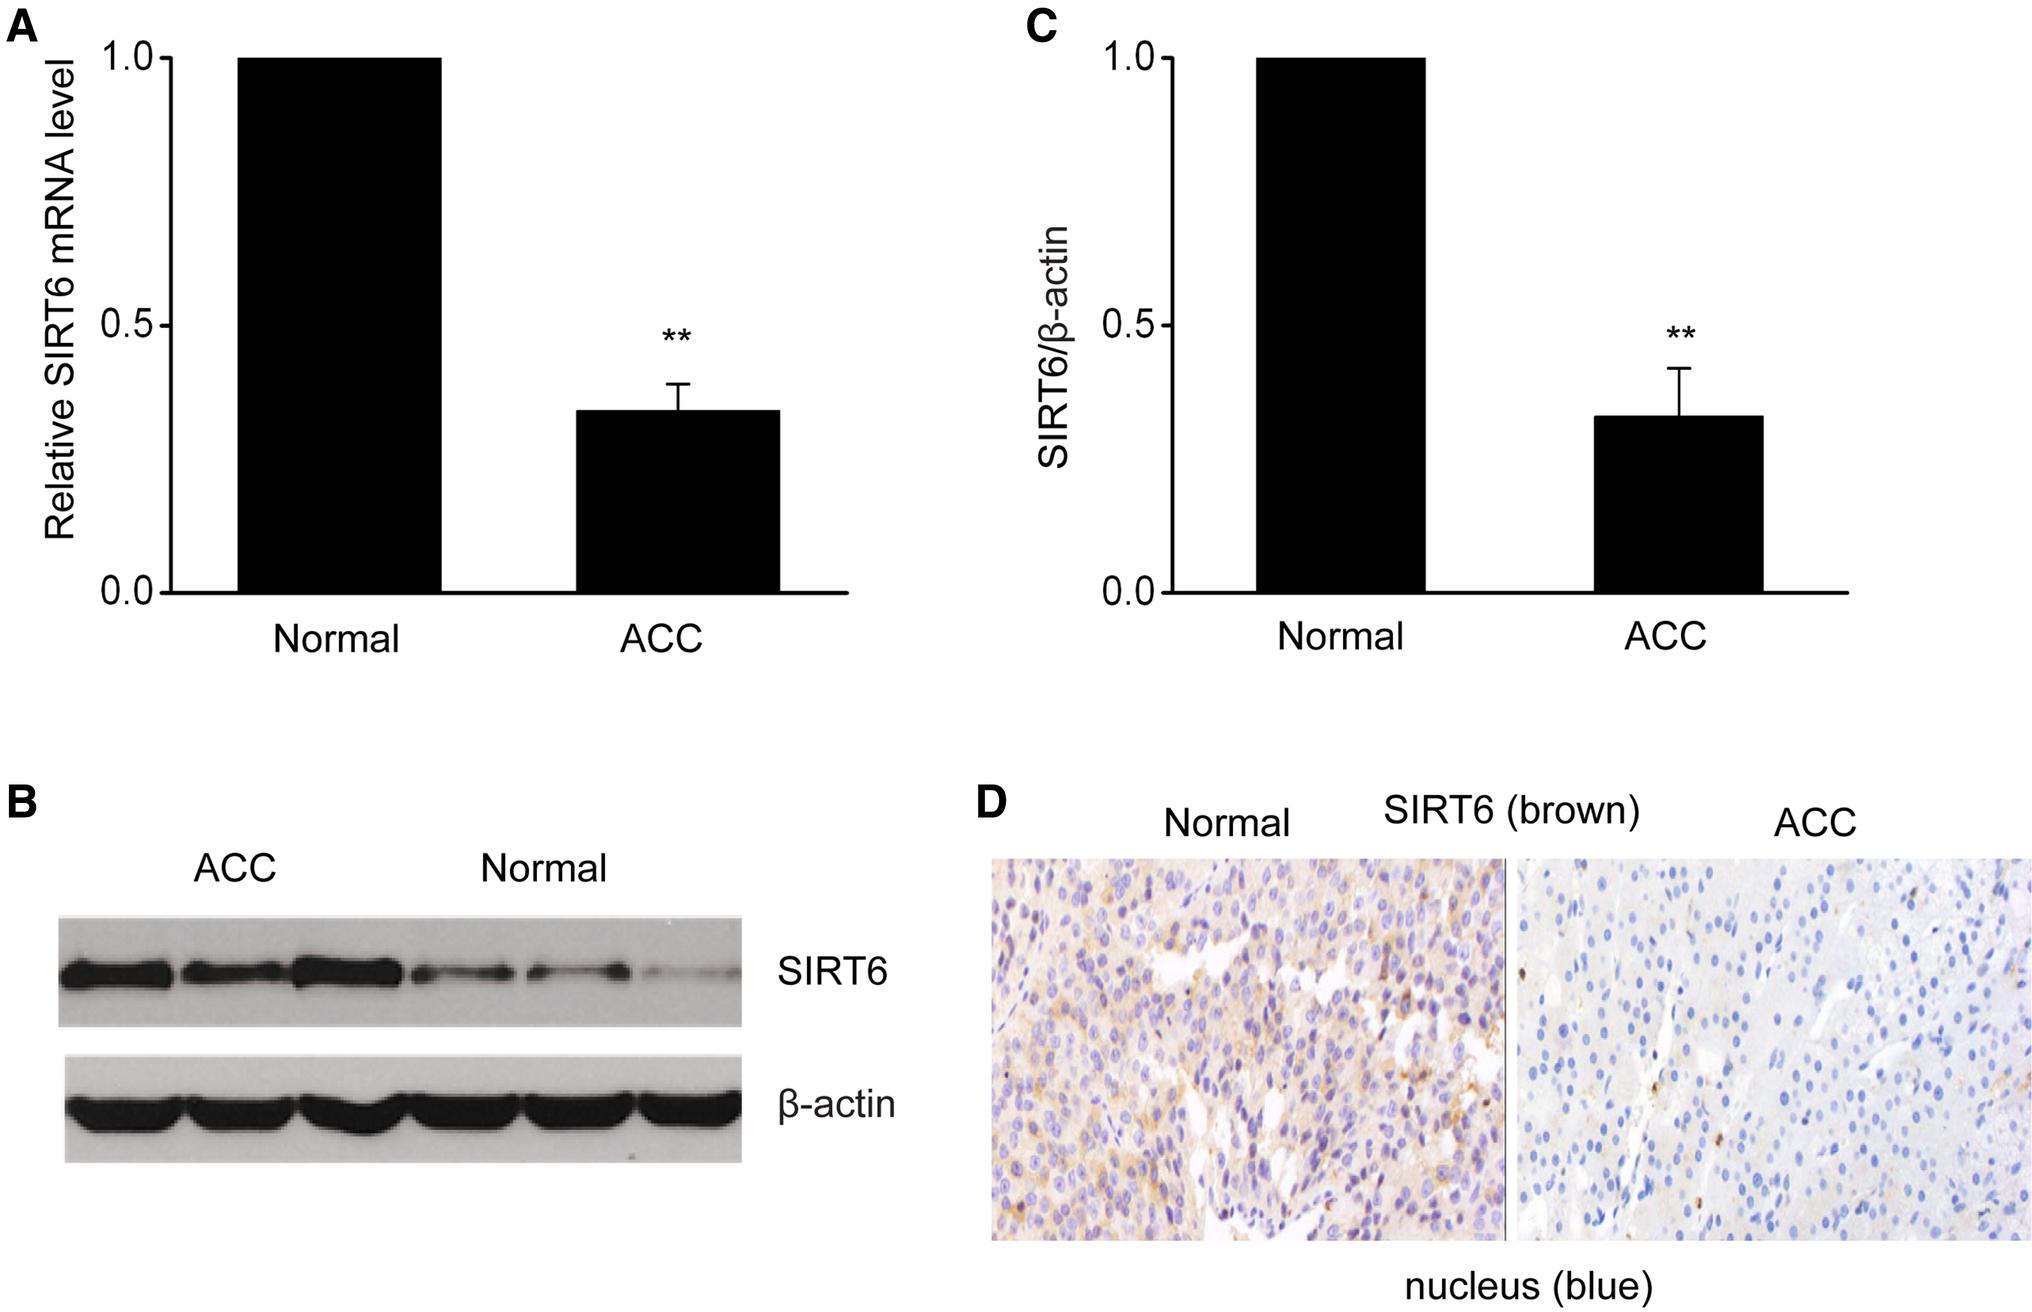 SIRT6 abrogation promotes adrenocortical carcinoma through